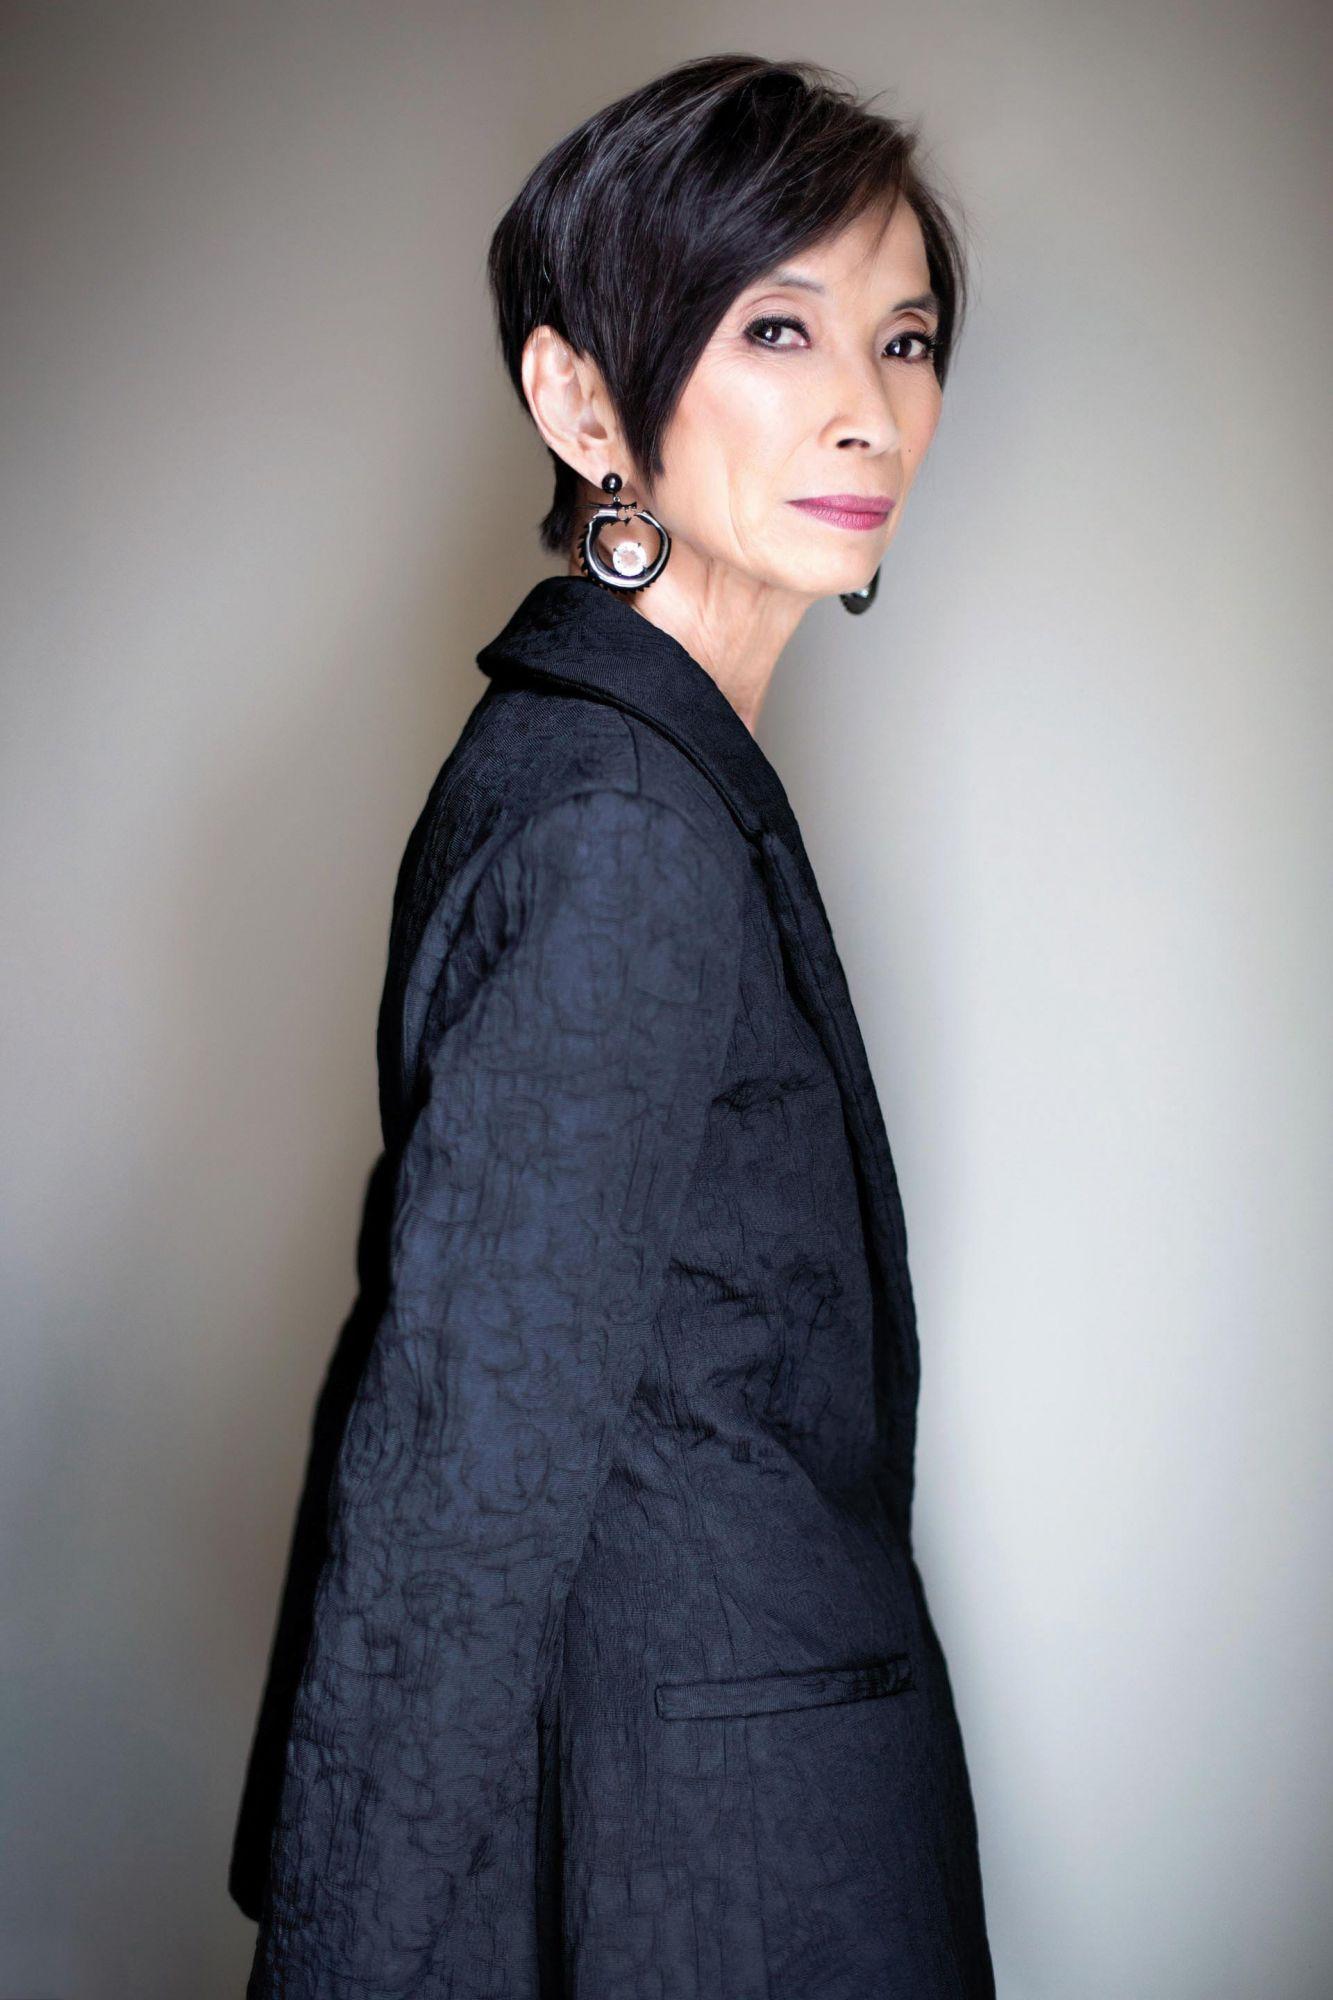 Filipino Fashion Icon Josie Natori Launches Her First Jewellery Line